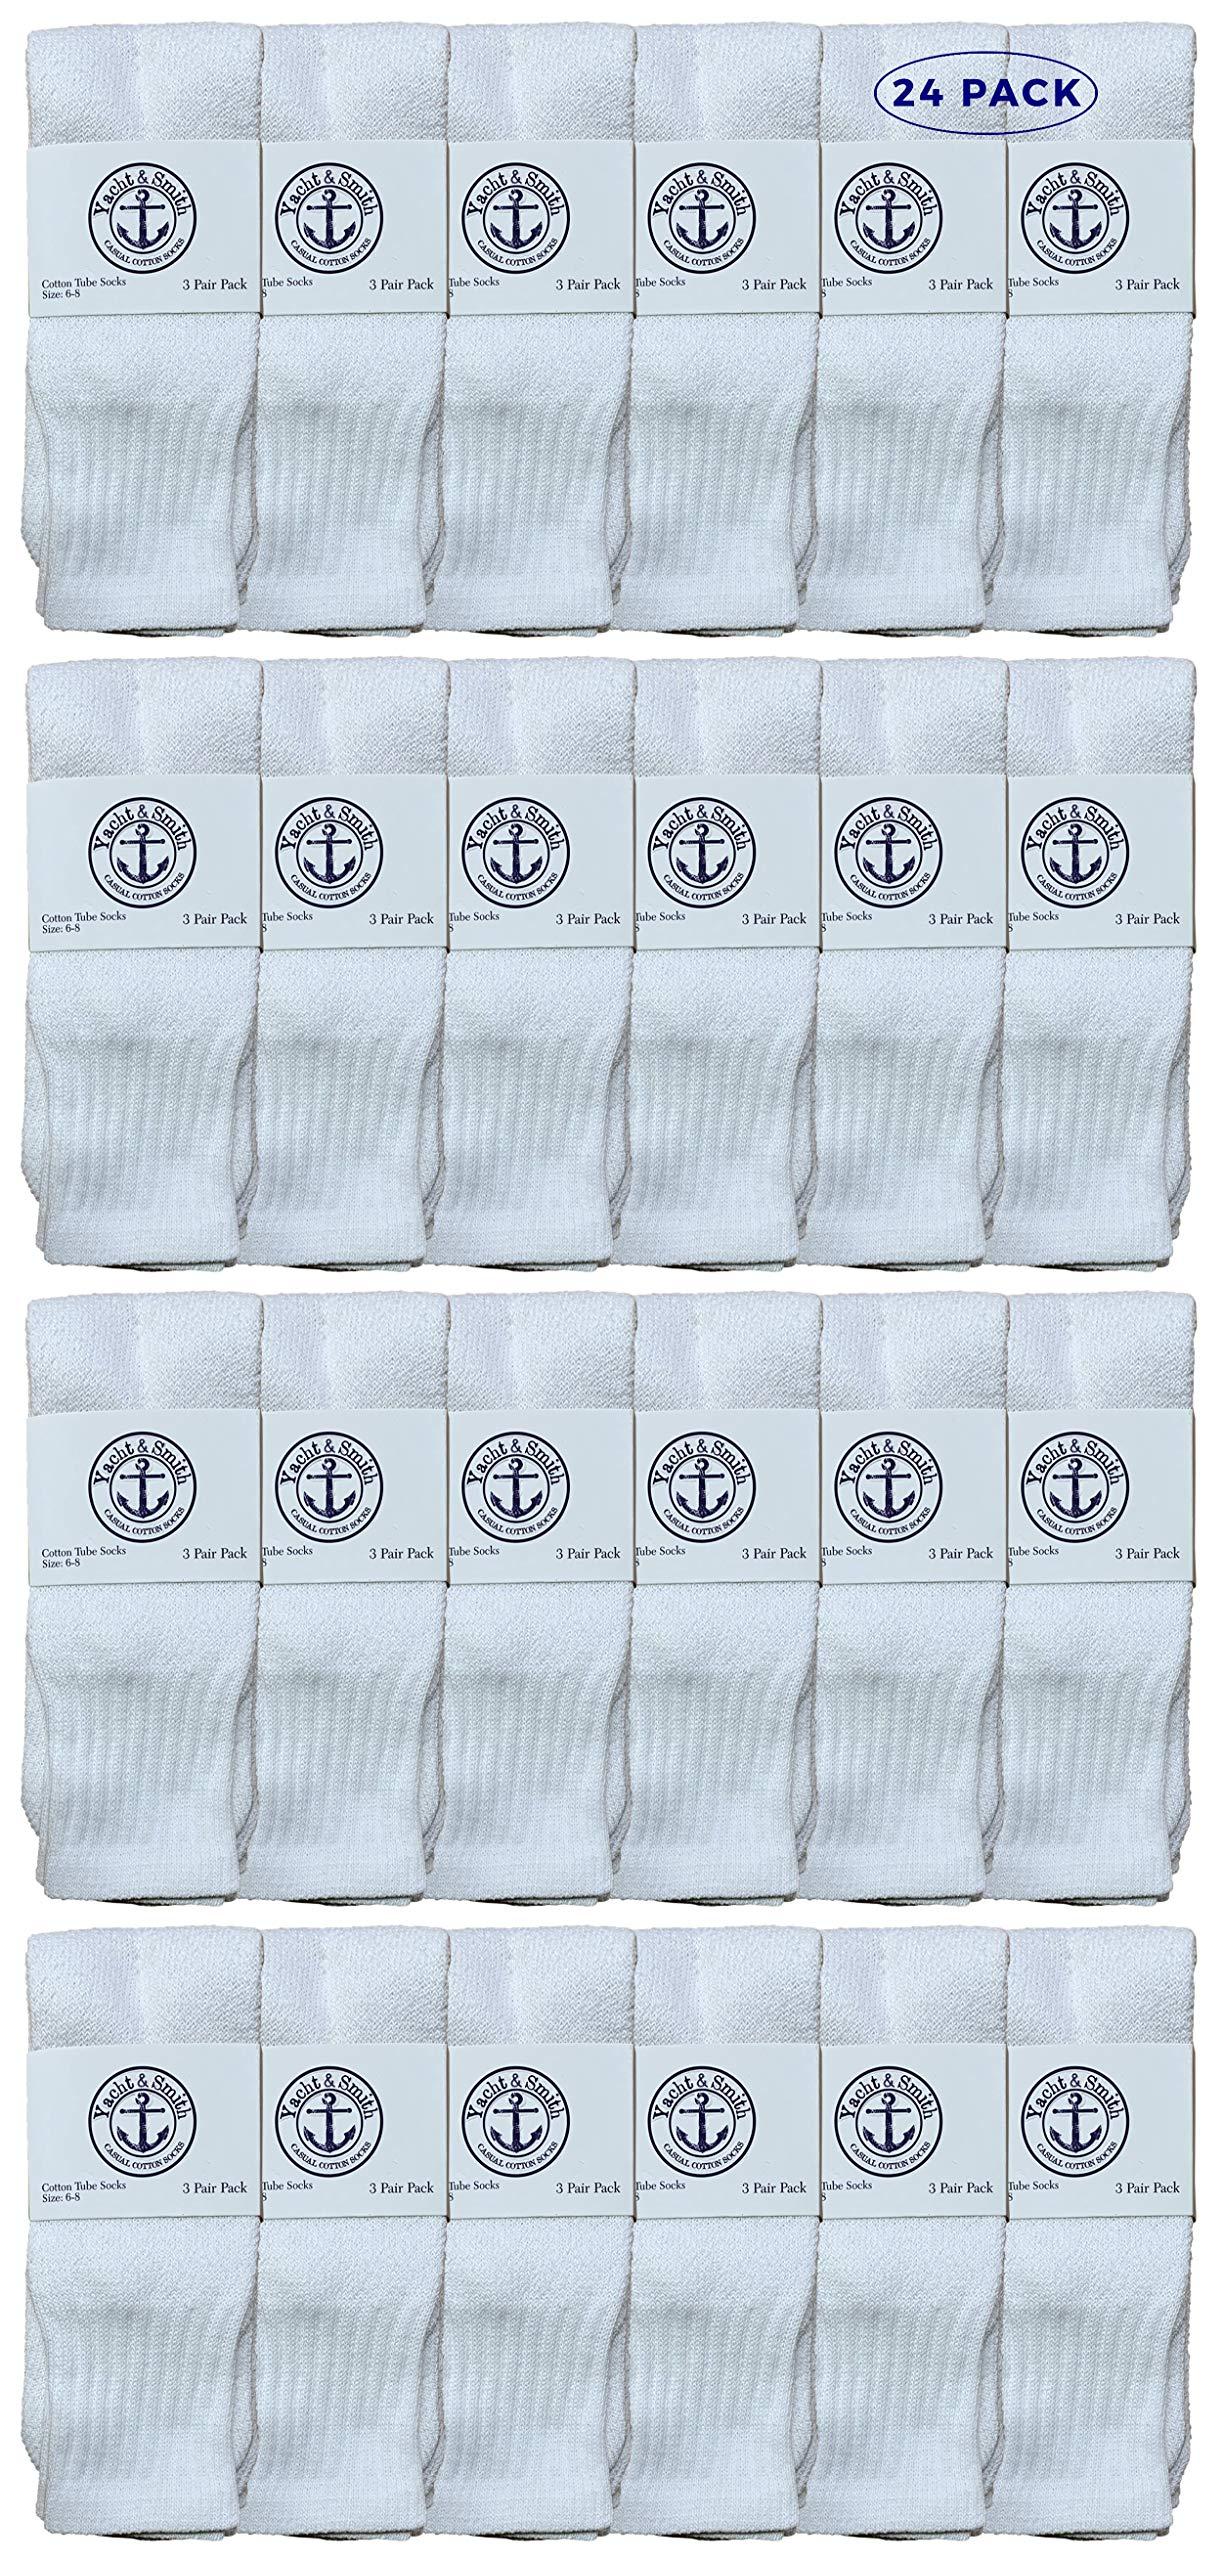 Yacht & Smith Wholesale Bulk Kids Tube Socks, Cotton Sport Athletic Tube Socks - 6-8 - White - 24 Packs by YACHT & SMITH